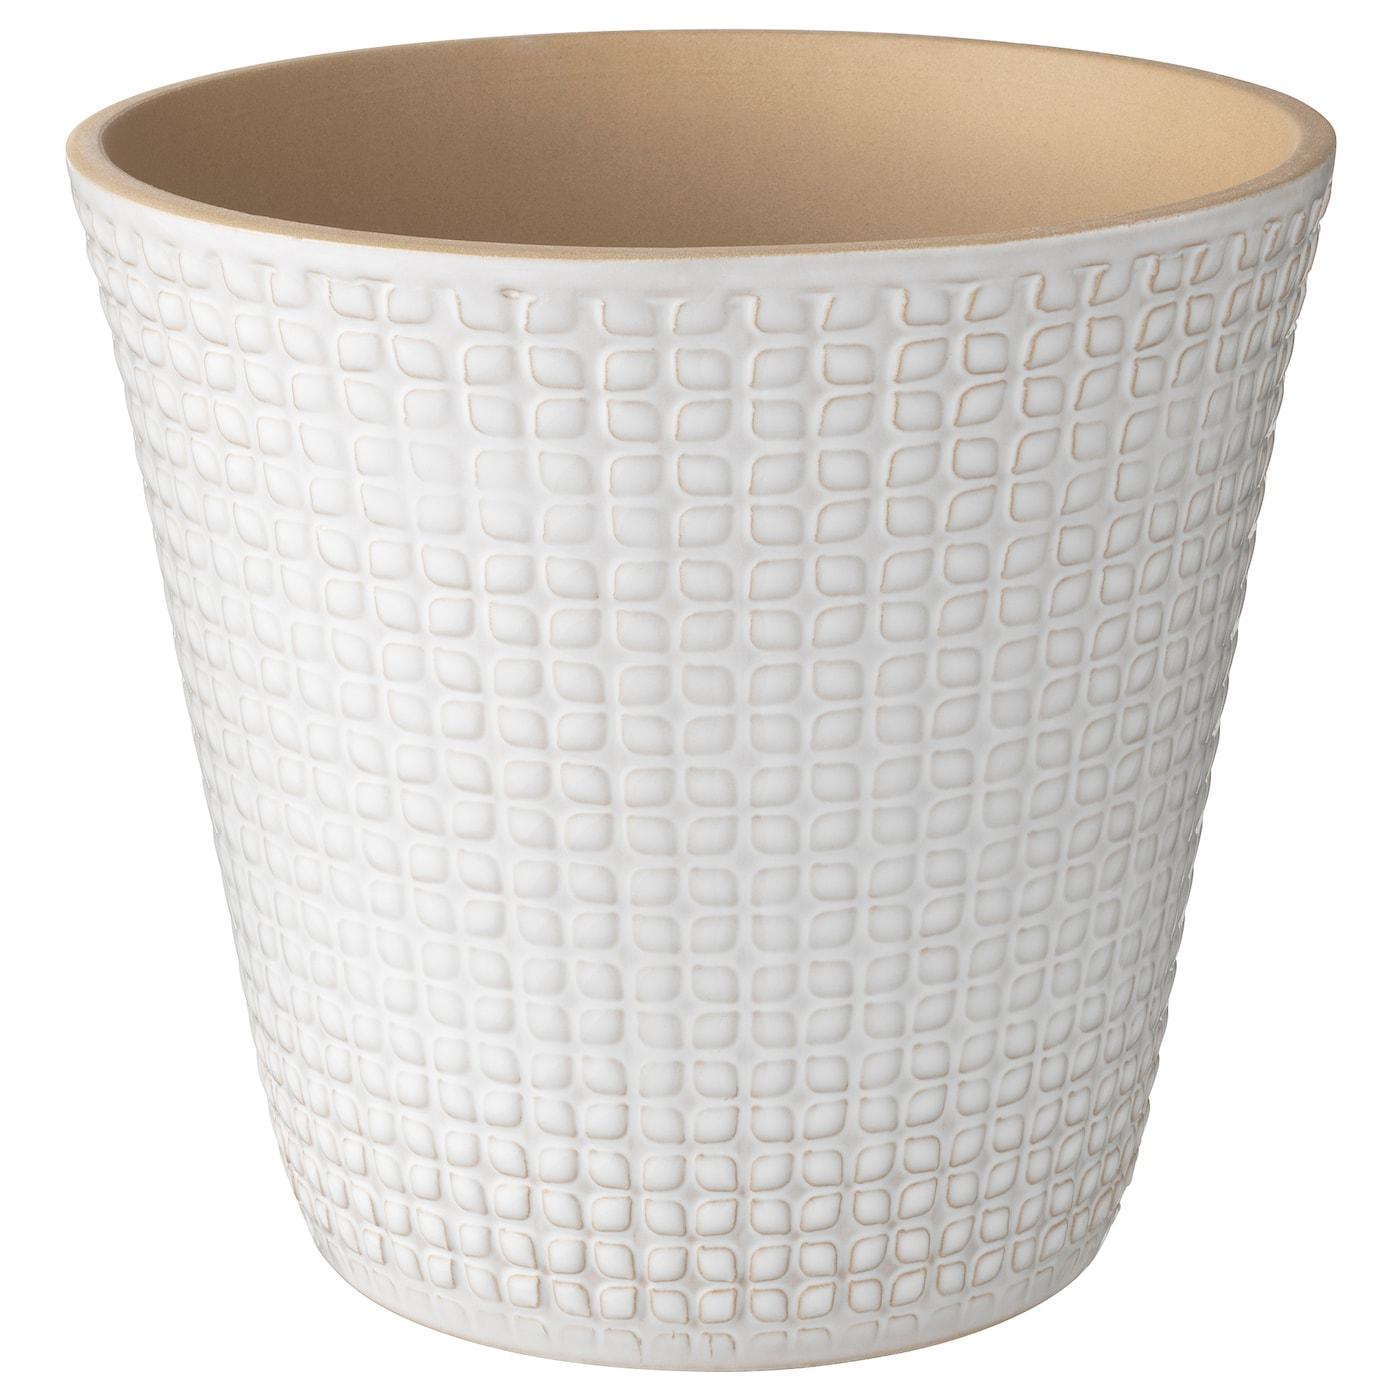 CHIAFRÖN Macetero blanco 19 cm